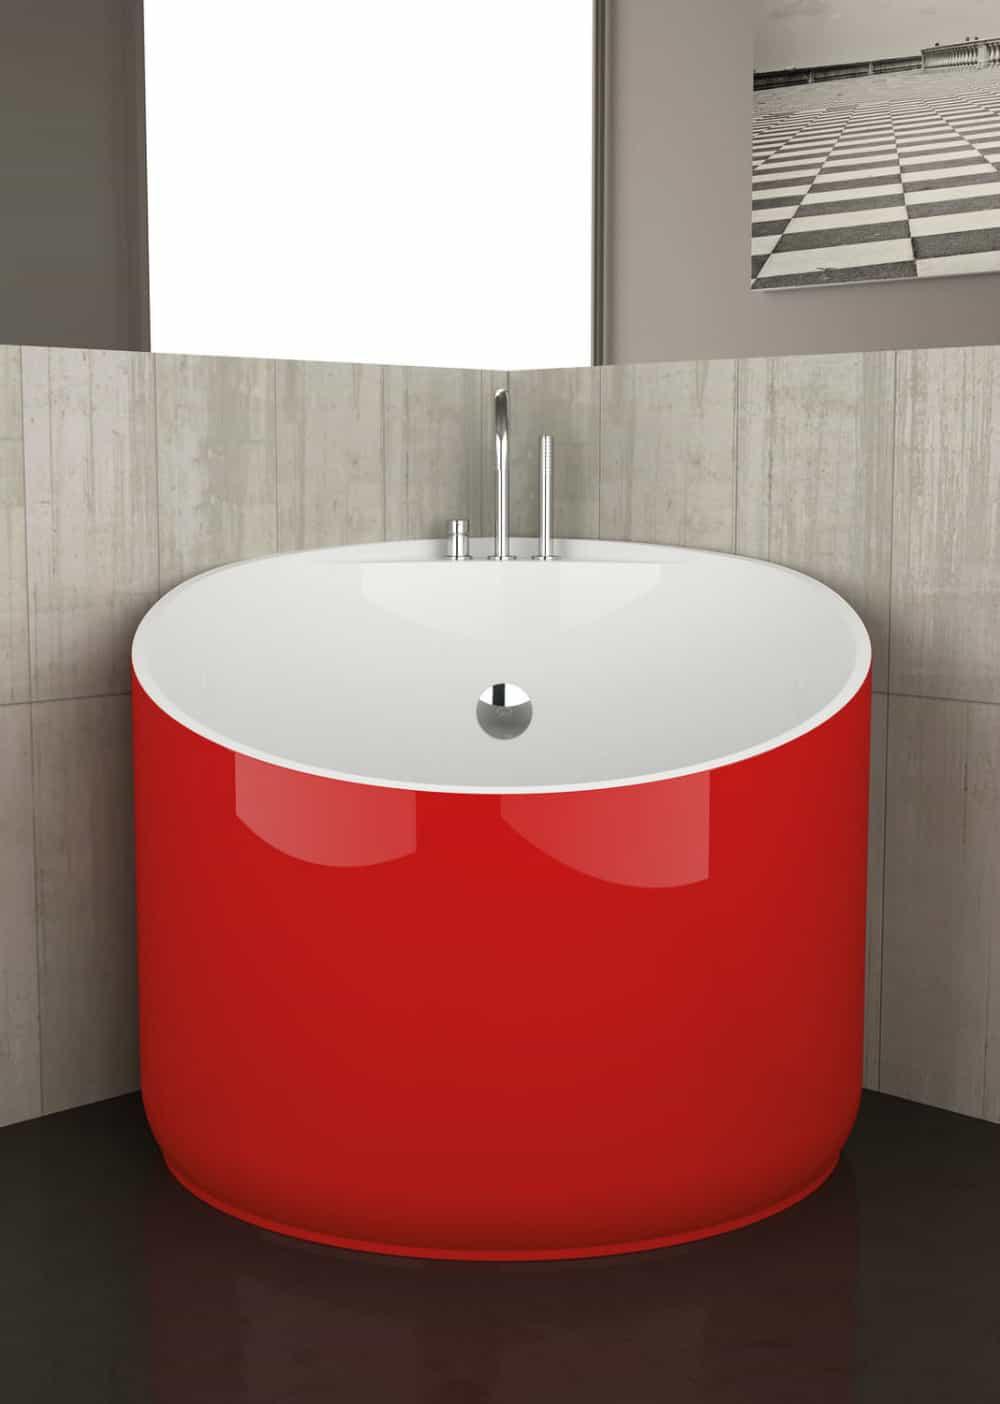 Acrylic mini bathtub